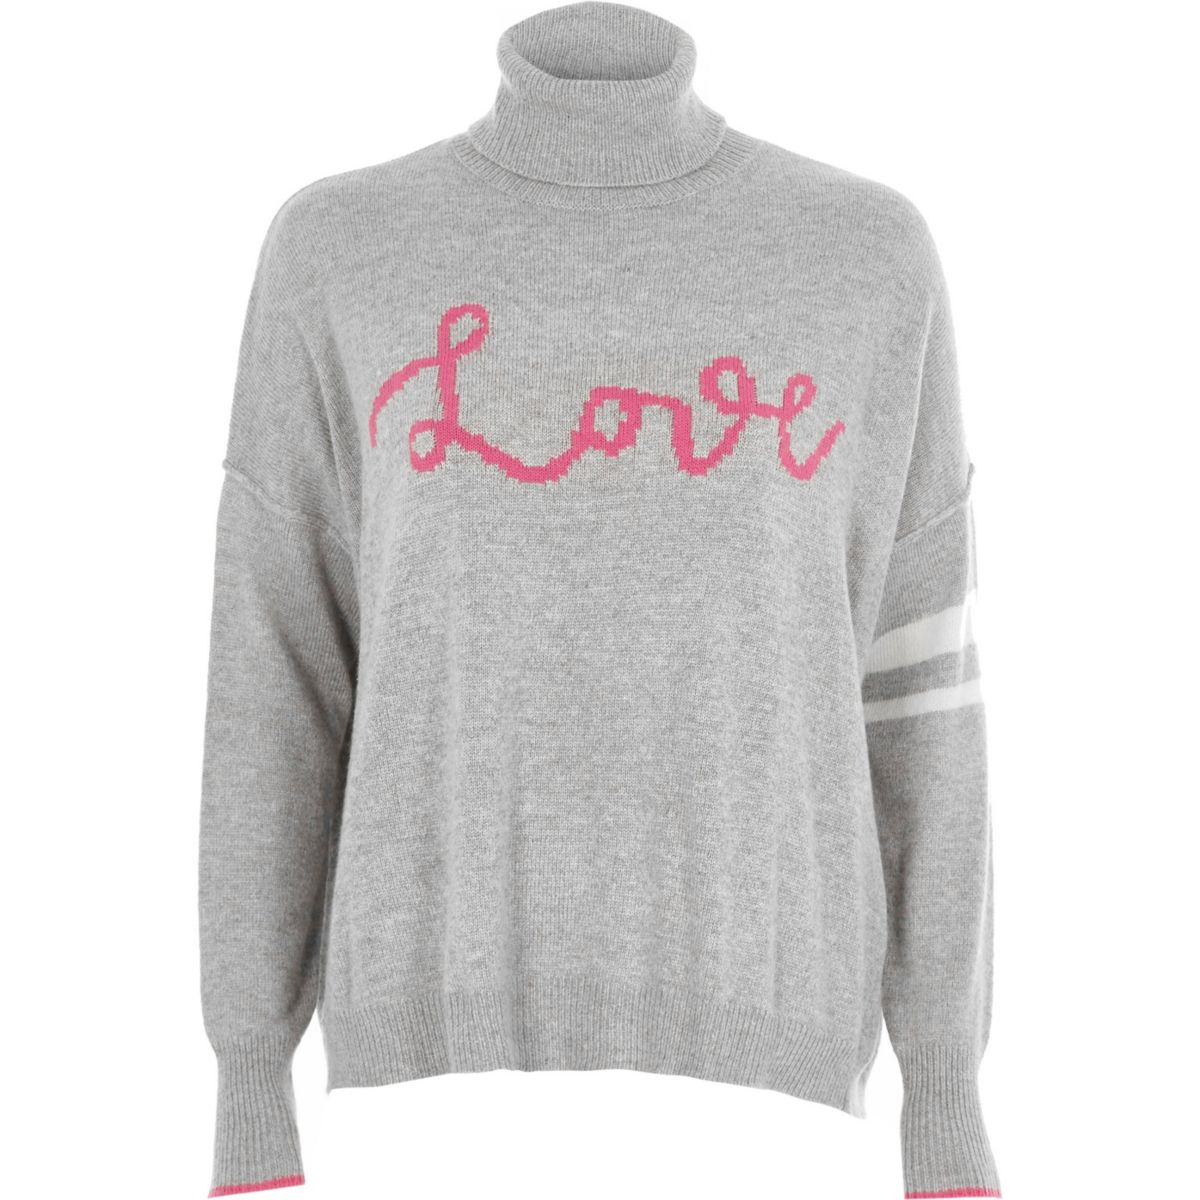 Grey 'love' roll neck knit sweater